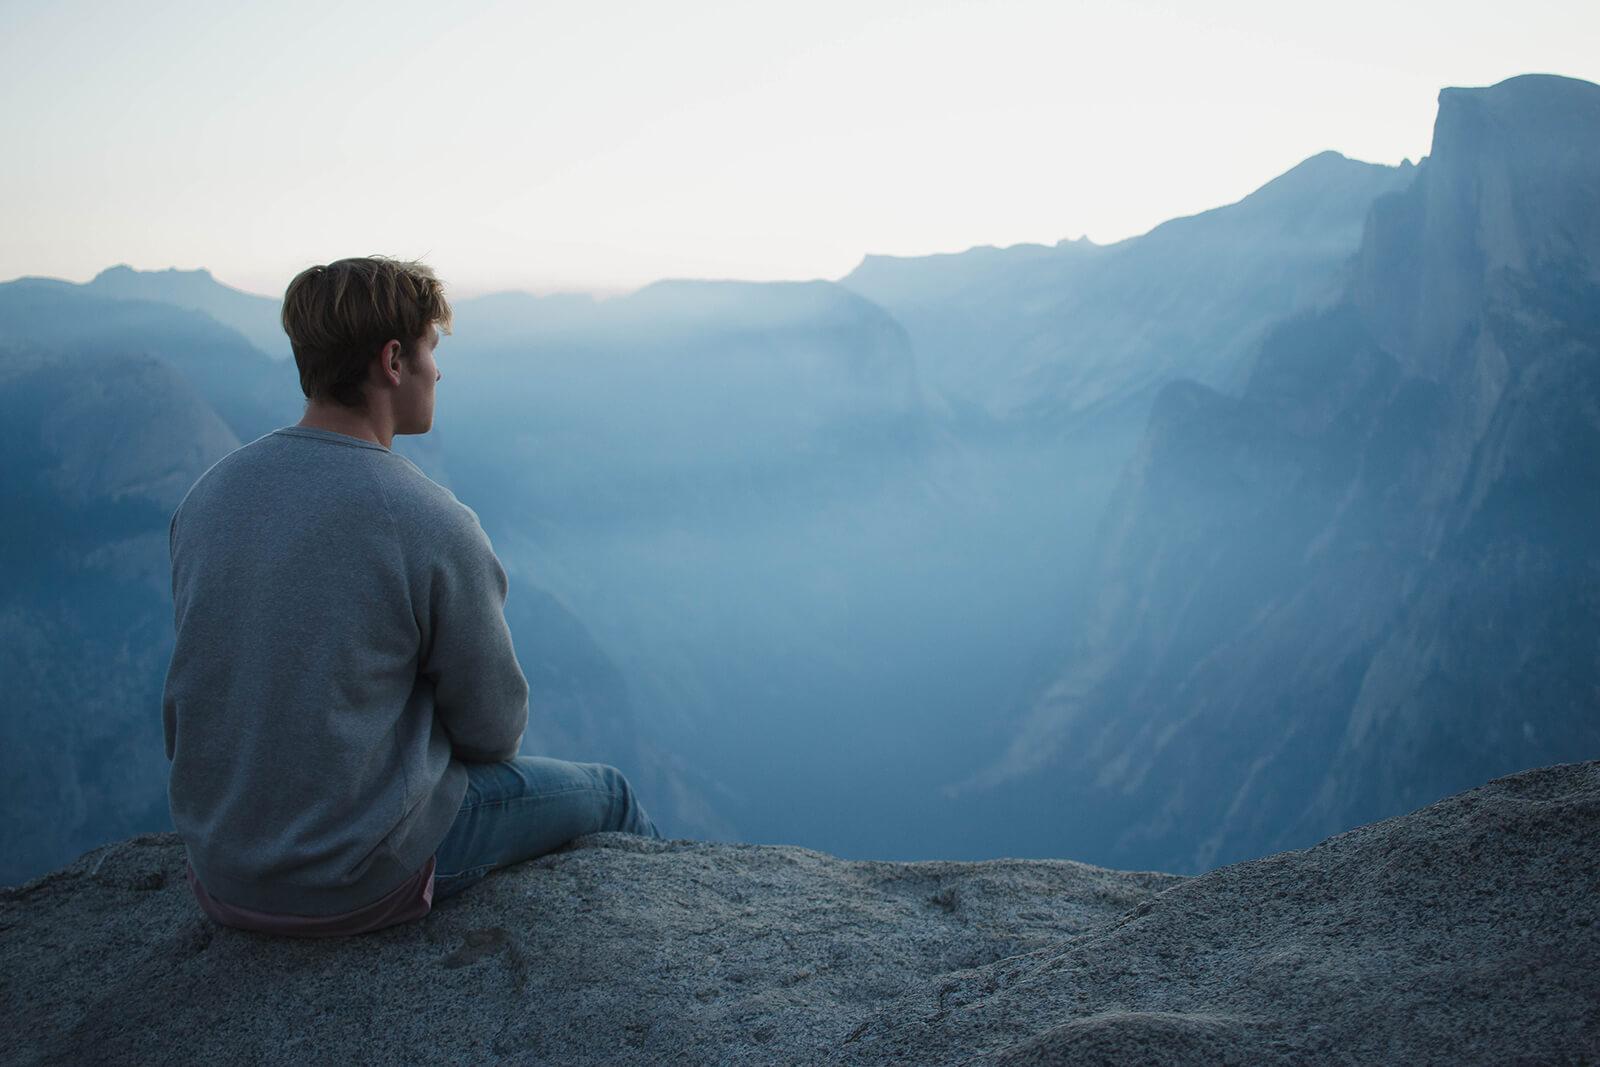 Man meditating on a clifftop